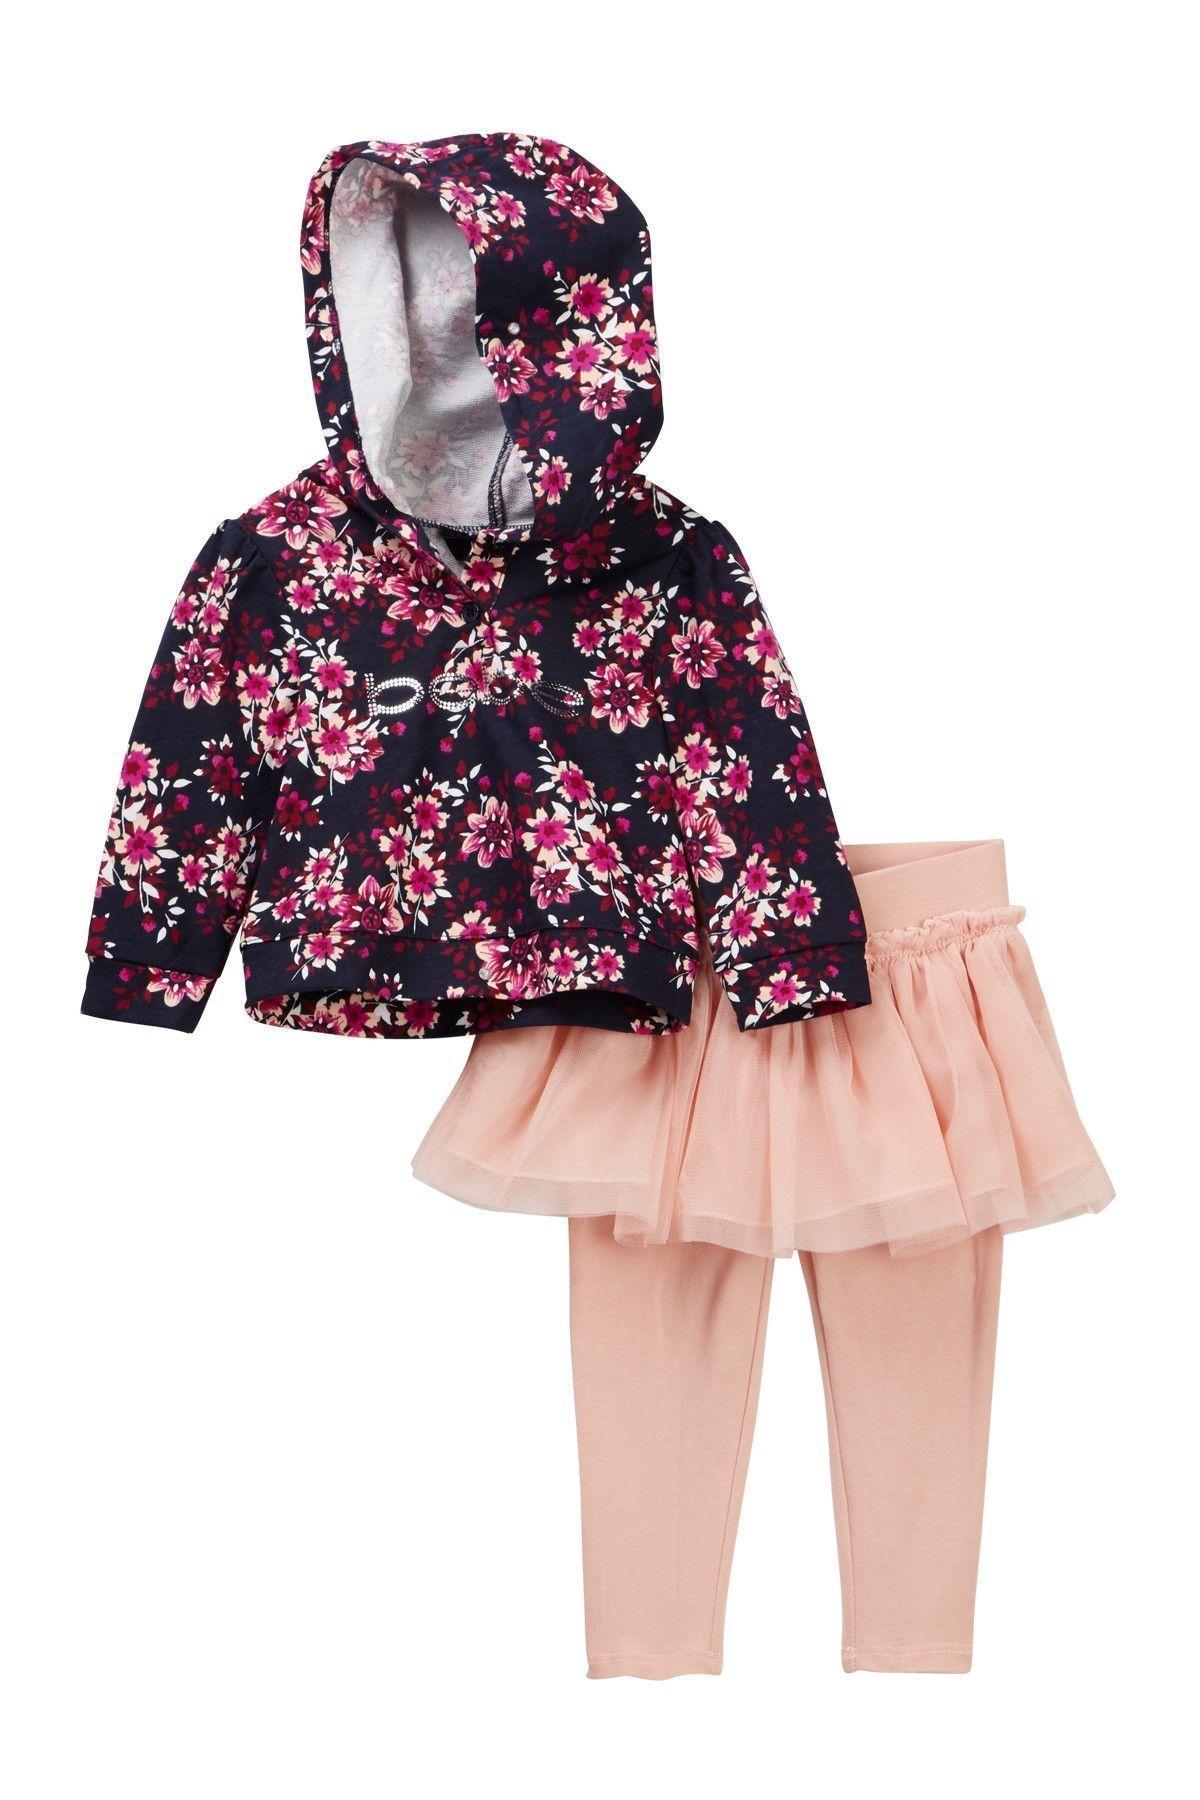 ce0d7c3cc0b4 Floral Hoodie 2-Piece Set (Baby Girls)  babygirlhoodie